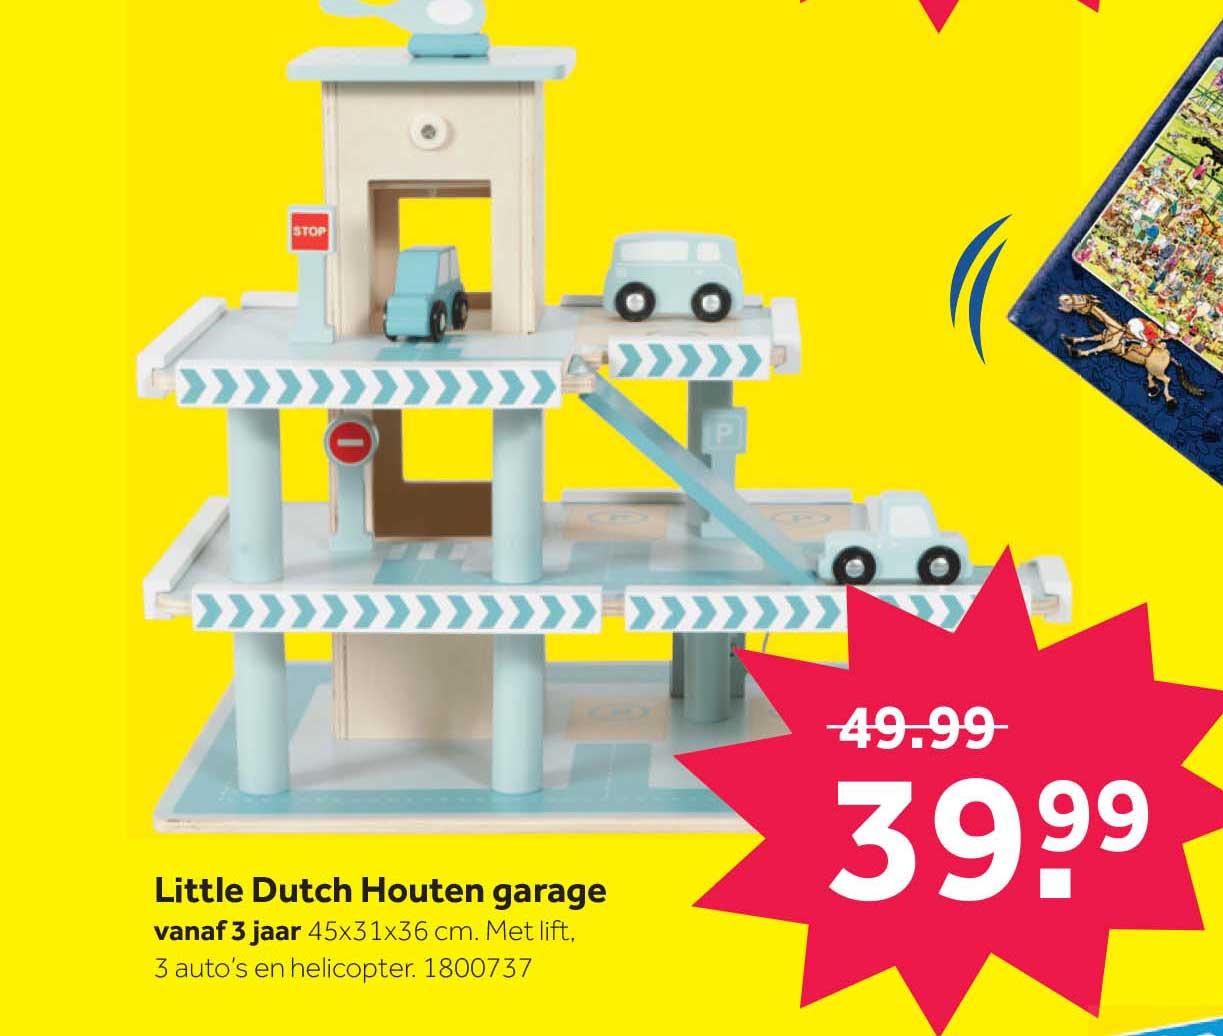 Intertoys Little Dutch Houten Garage